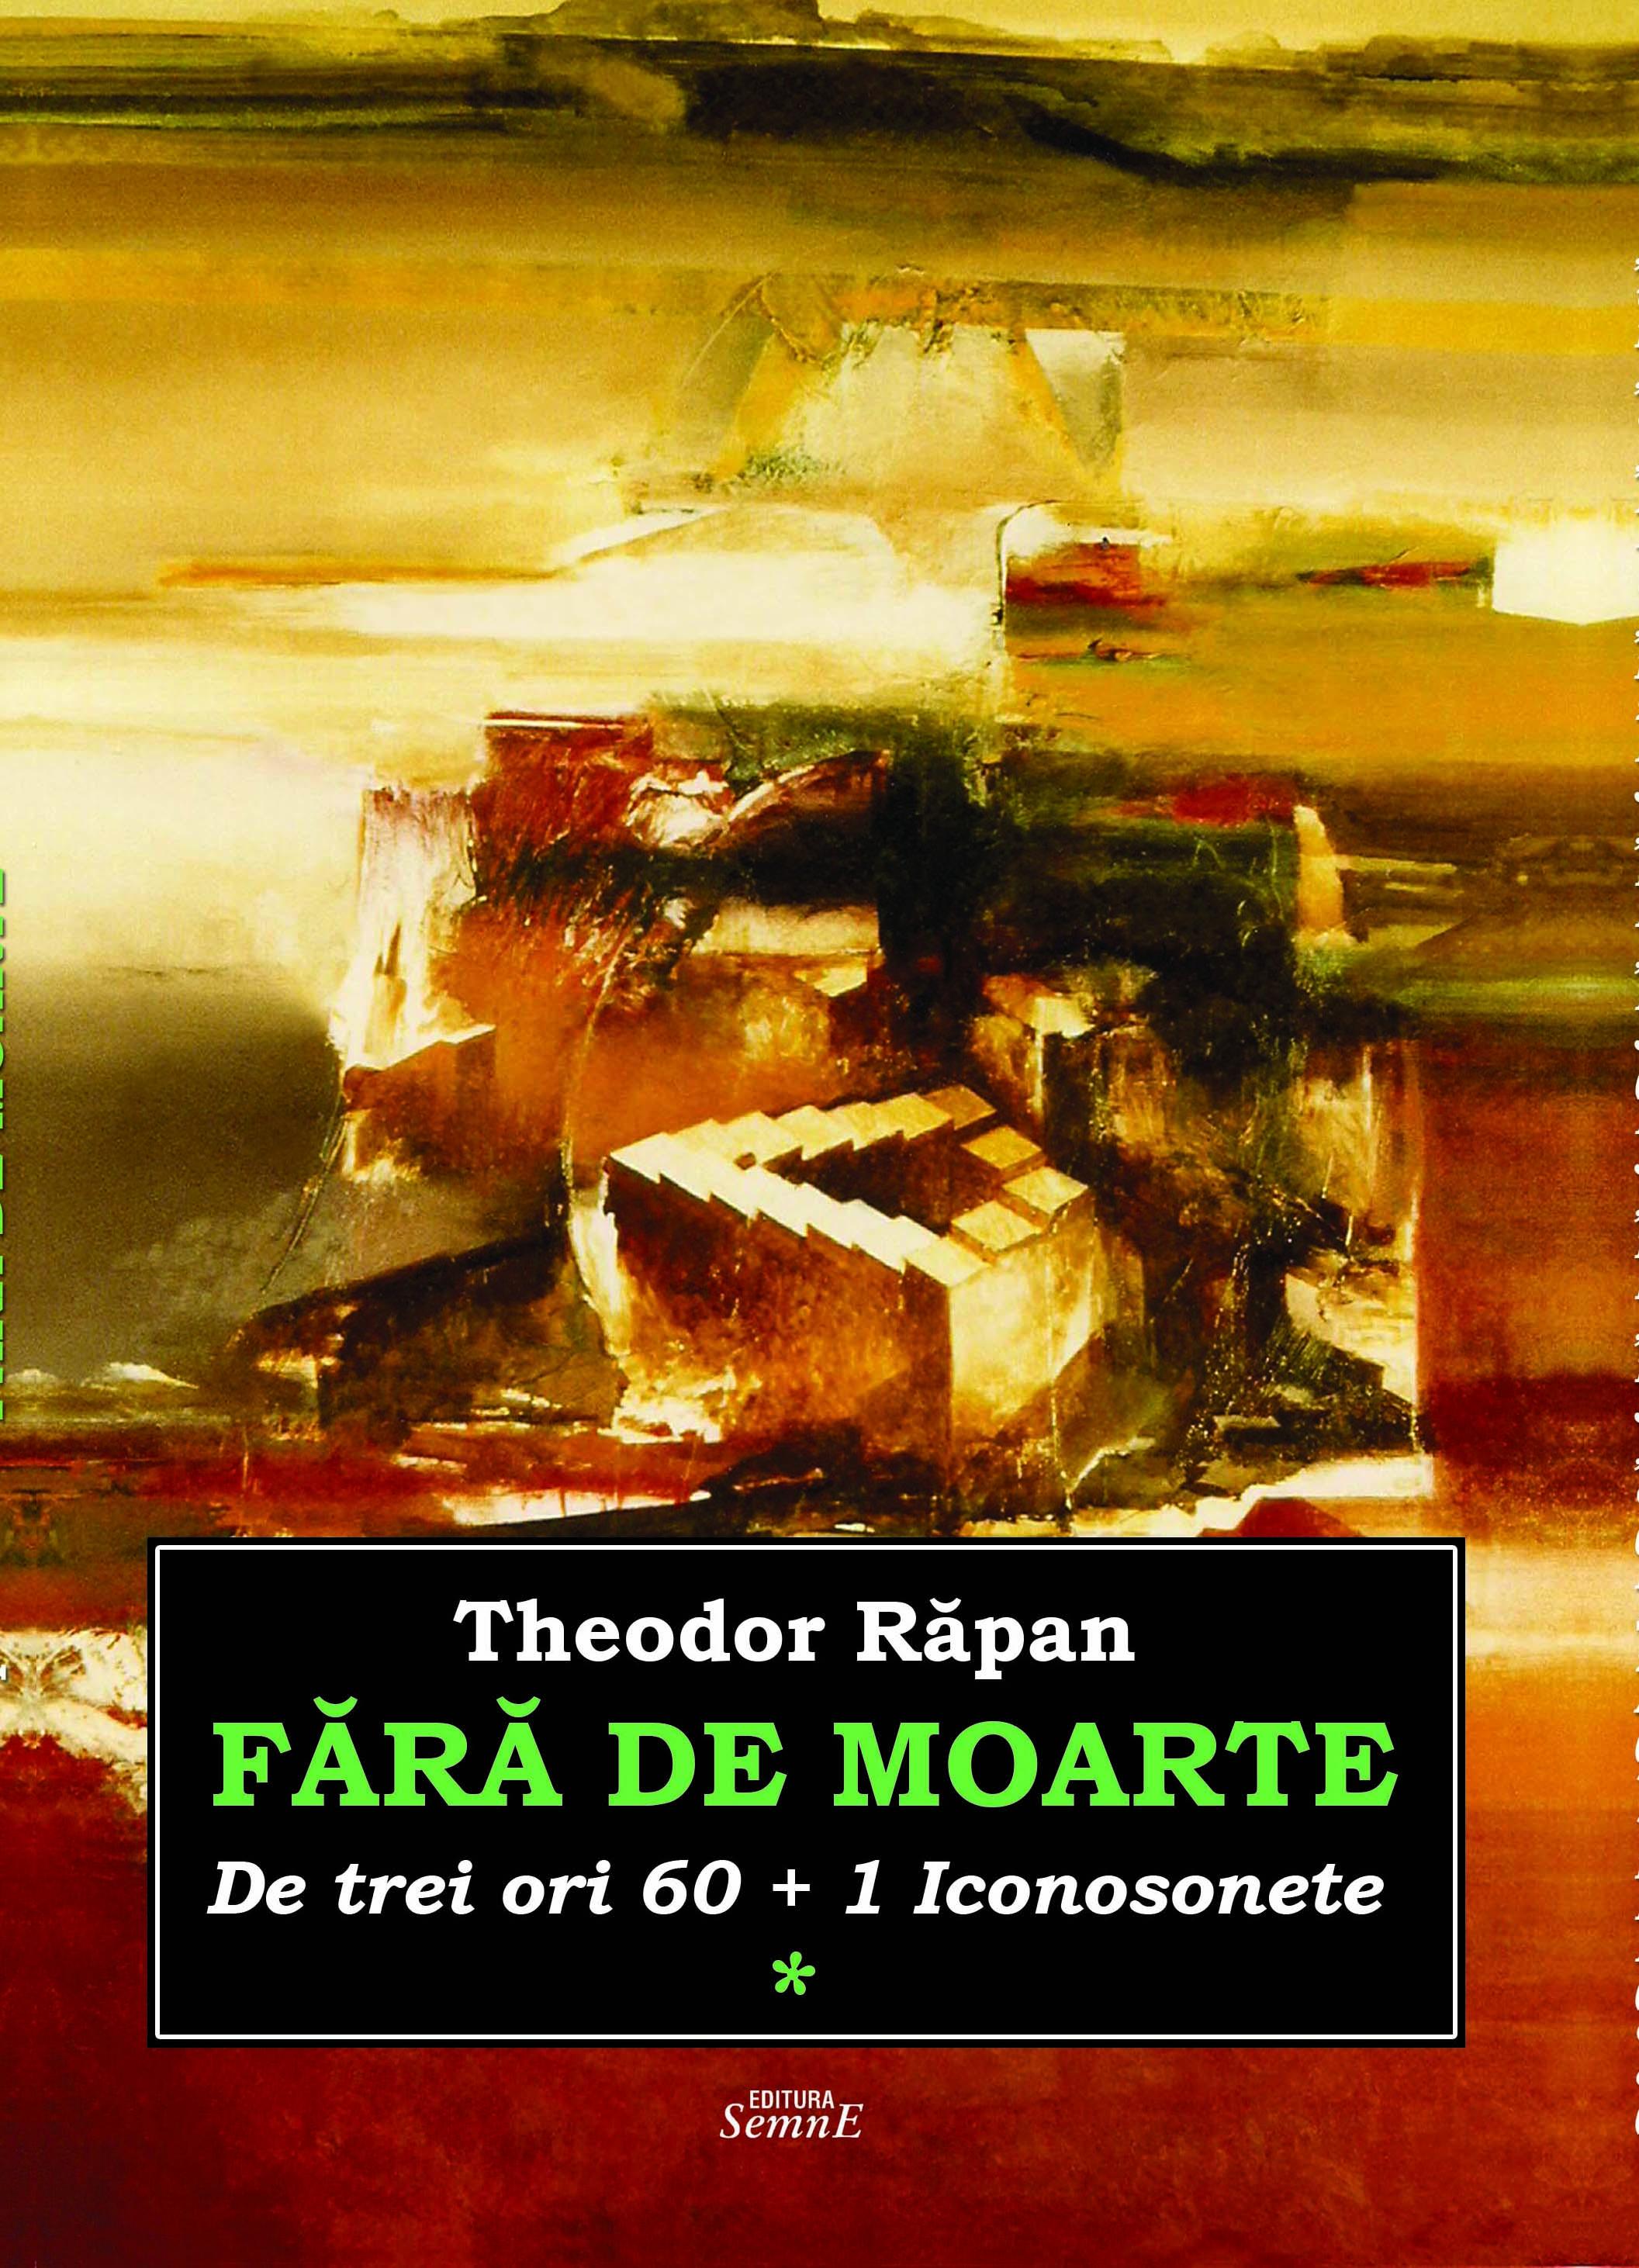 cop_fara_moarte1